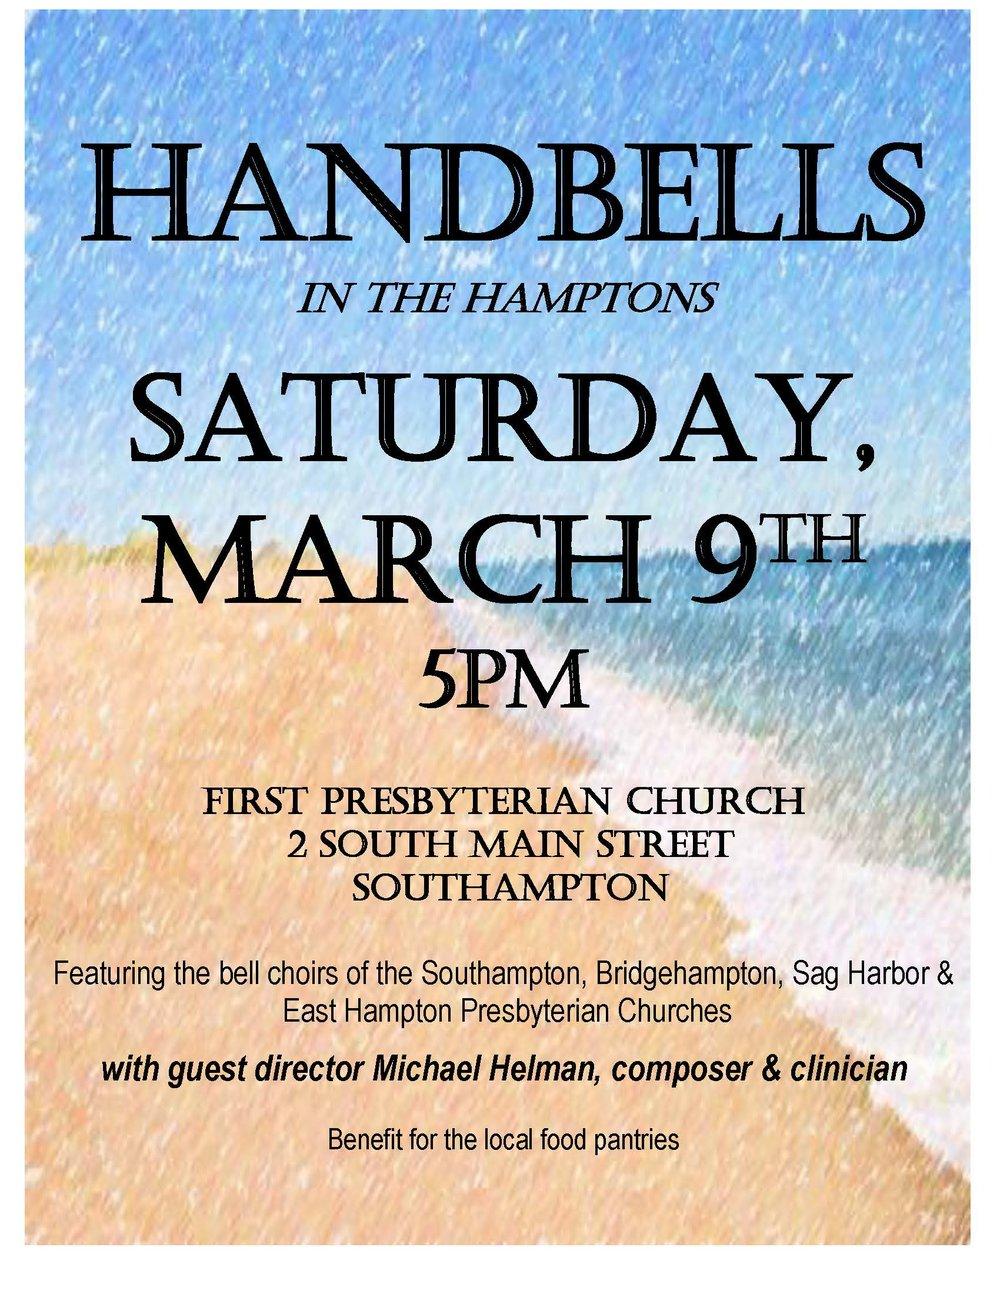 Handbells in the Hamptons poster 8x11.jpg